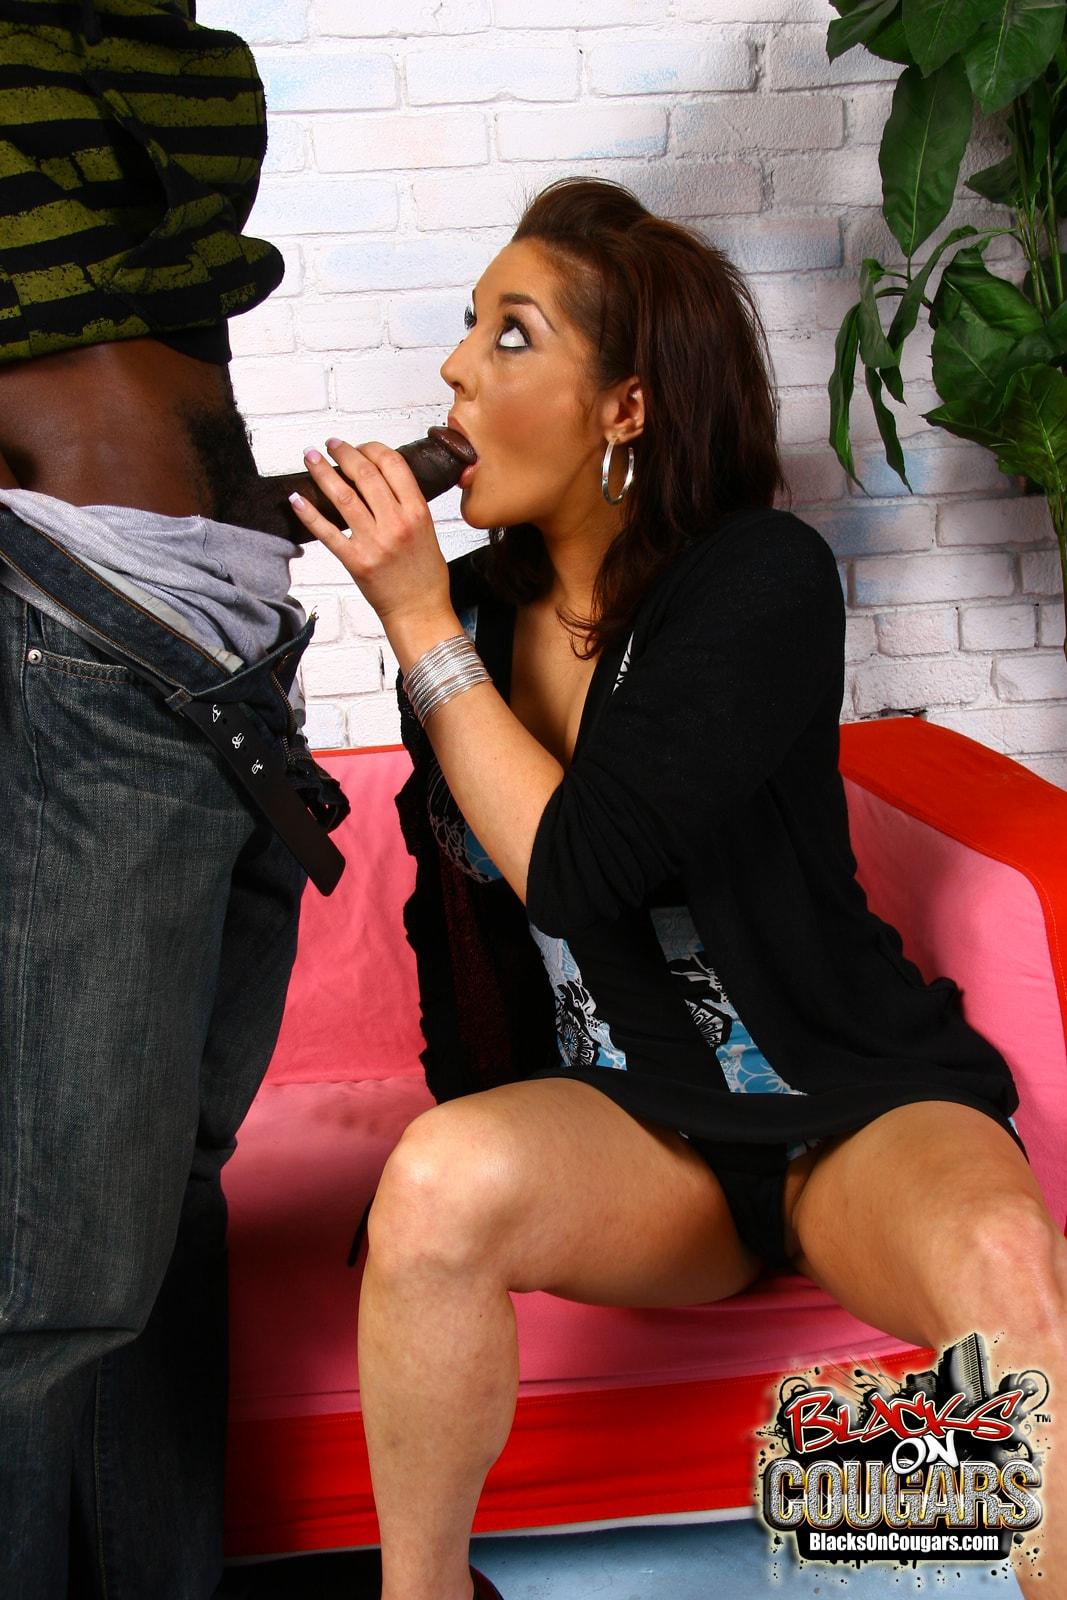 Dogfart '- Blacks On Cougars' starring Bobbi Lennox (Photo 14)